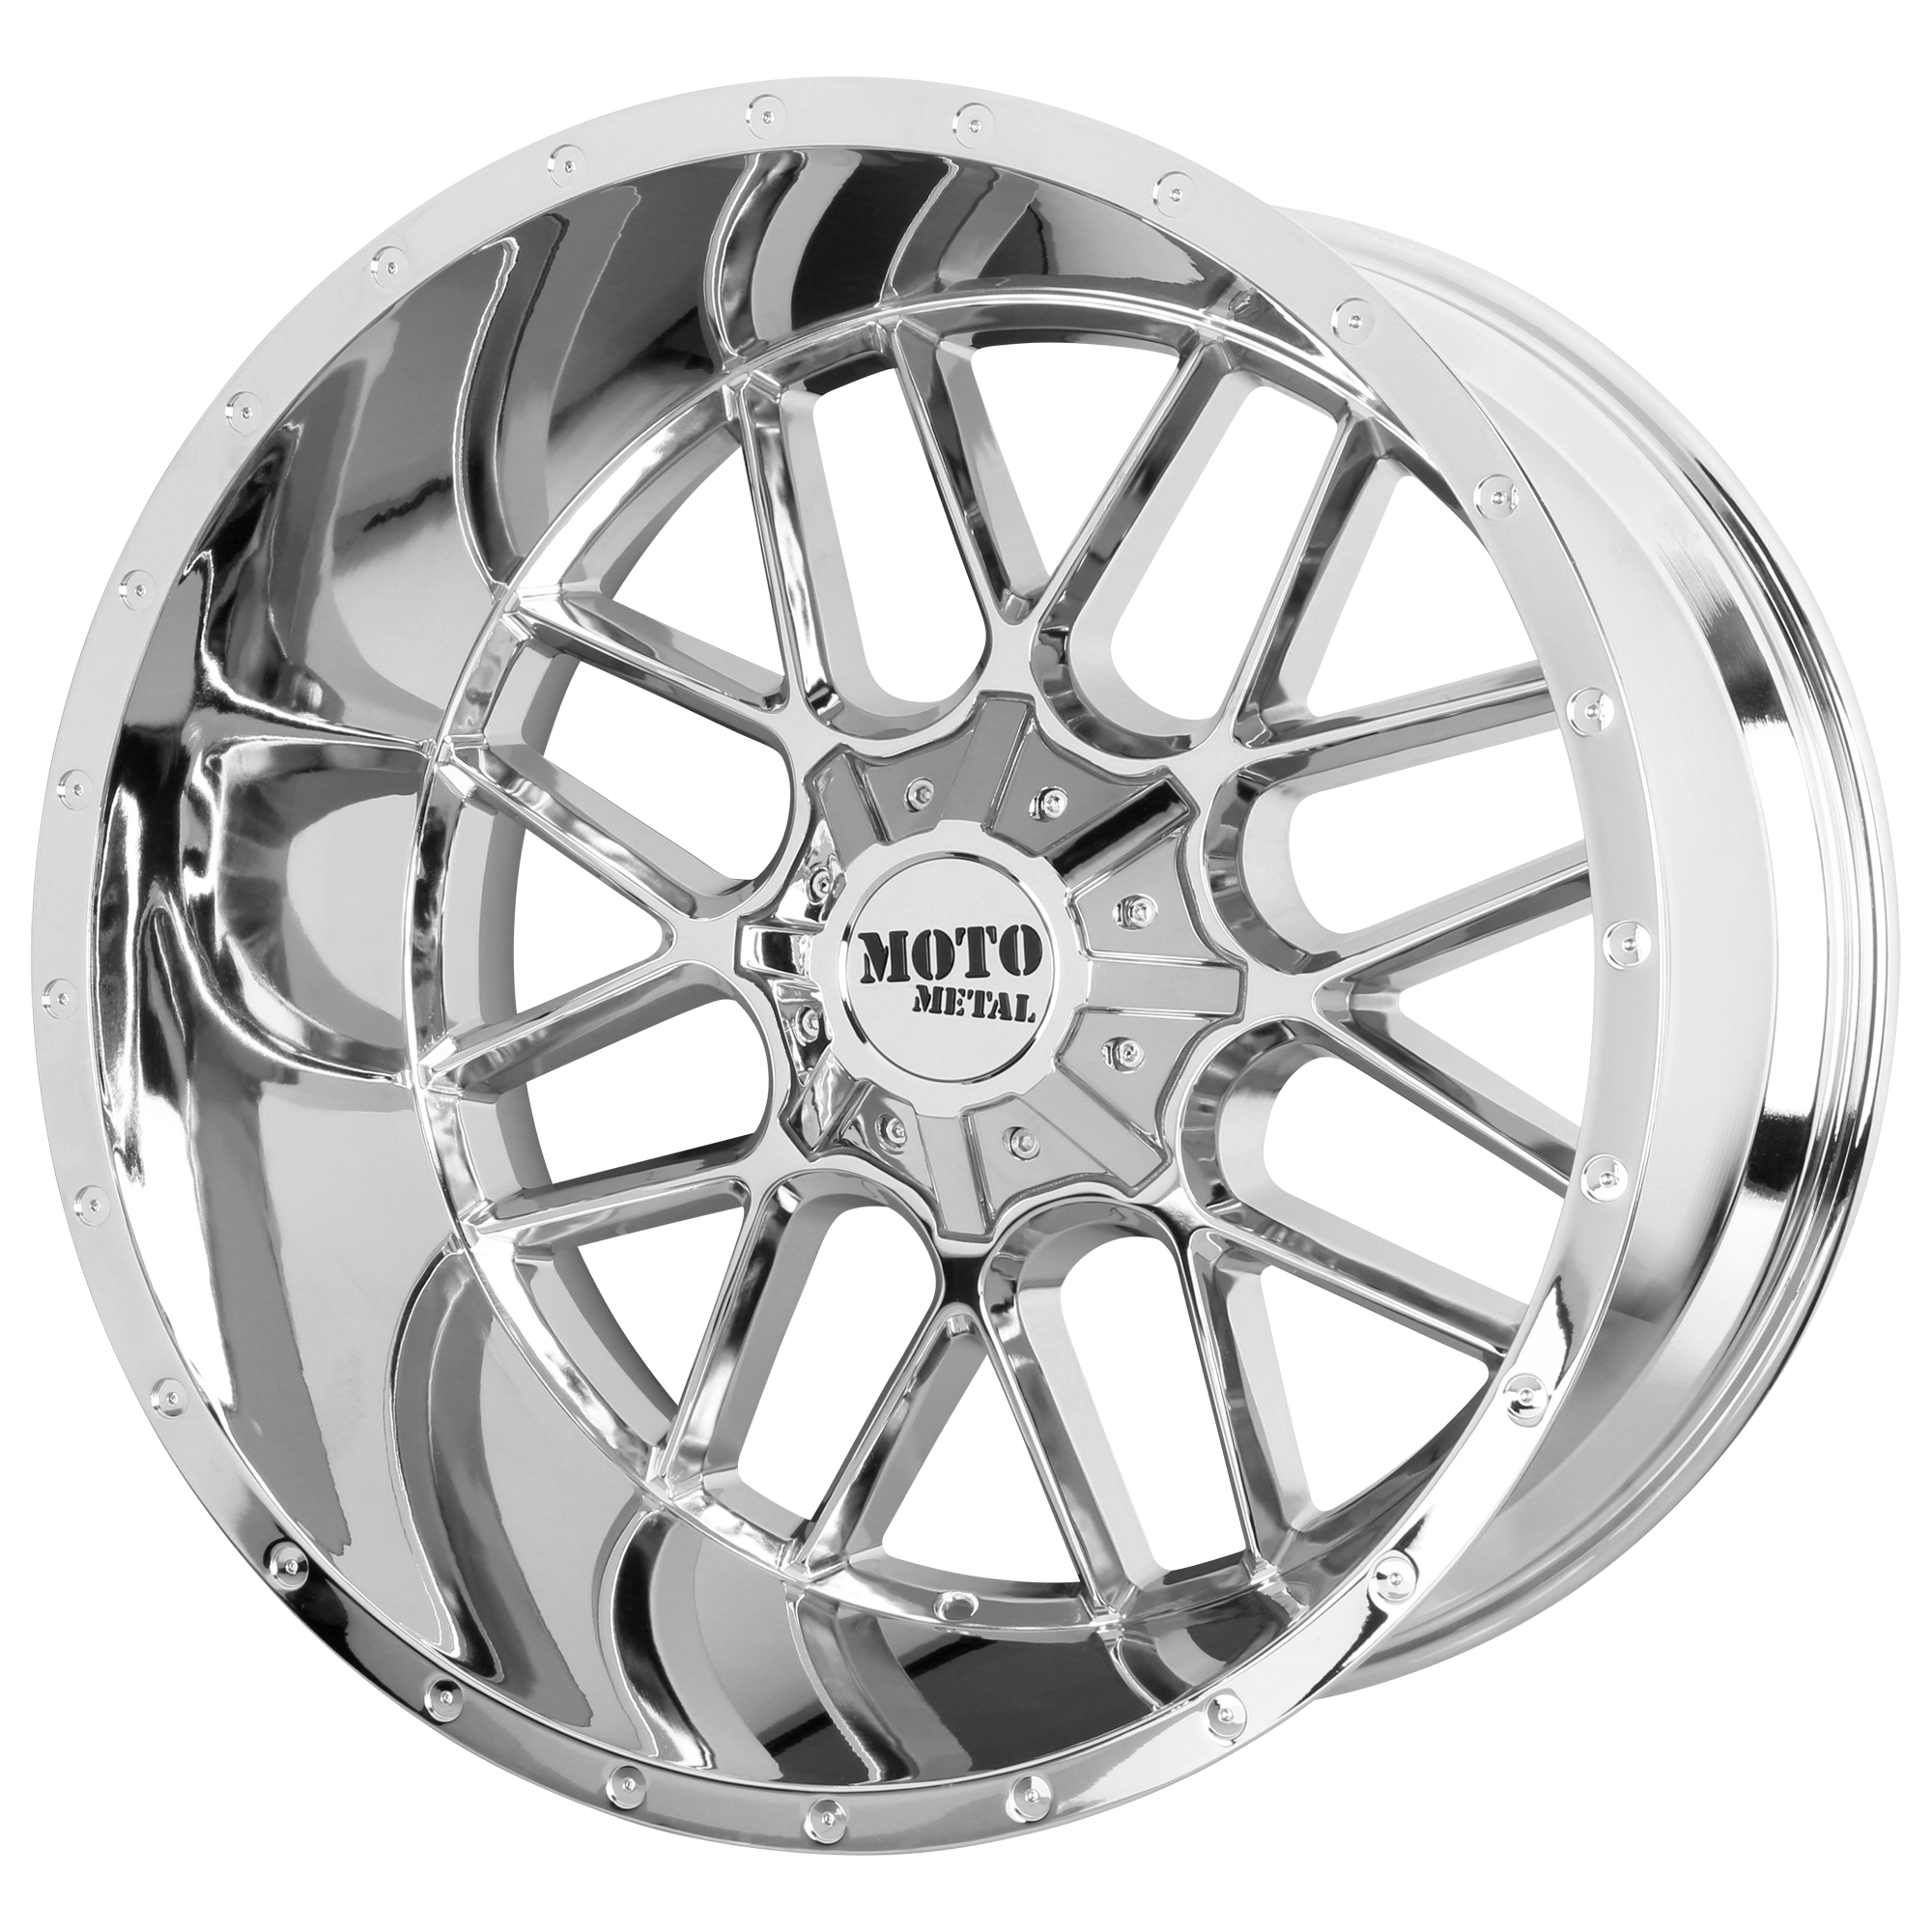 MOTO METAL MO986 SIEGE hliníkové disky 12x20 6x135 ET-44 Chrome